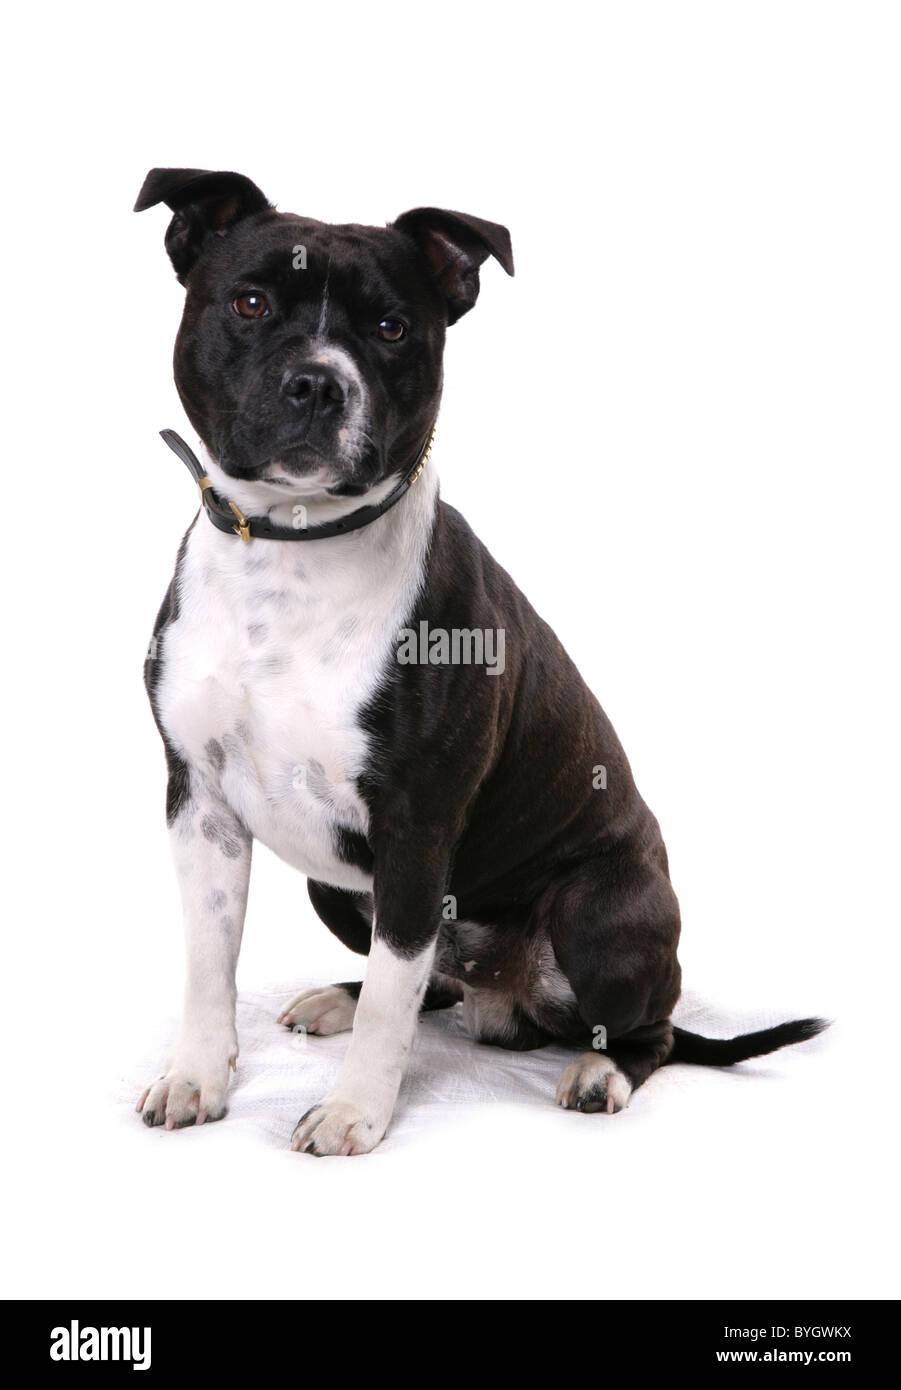 Staffordshire Bull Terrier Dog Single Female Adult Sitting Studio Stock Photo